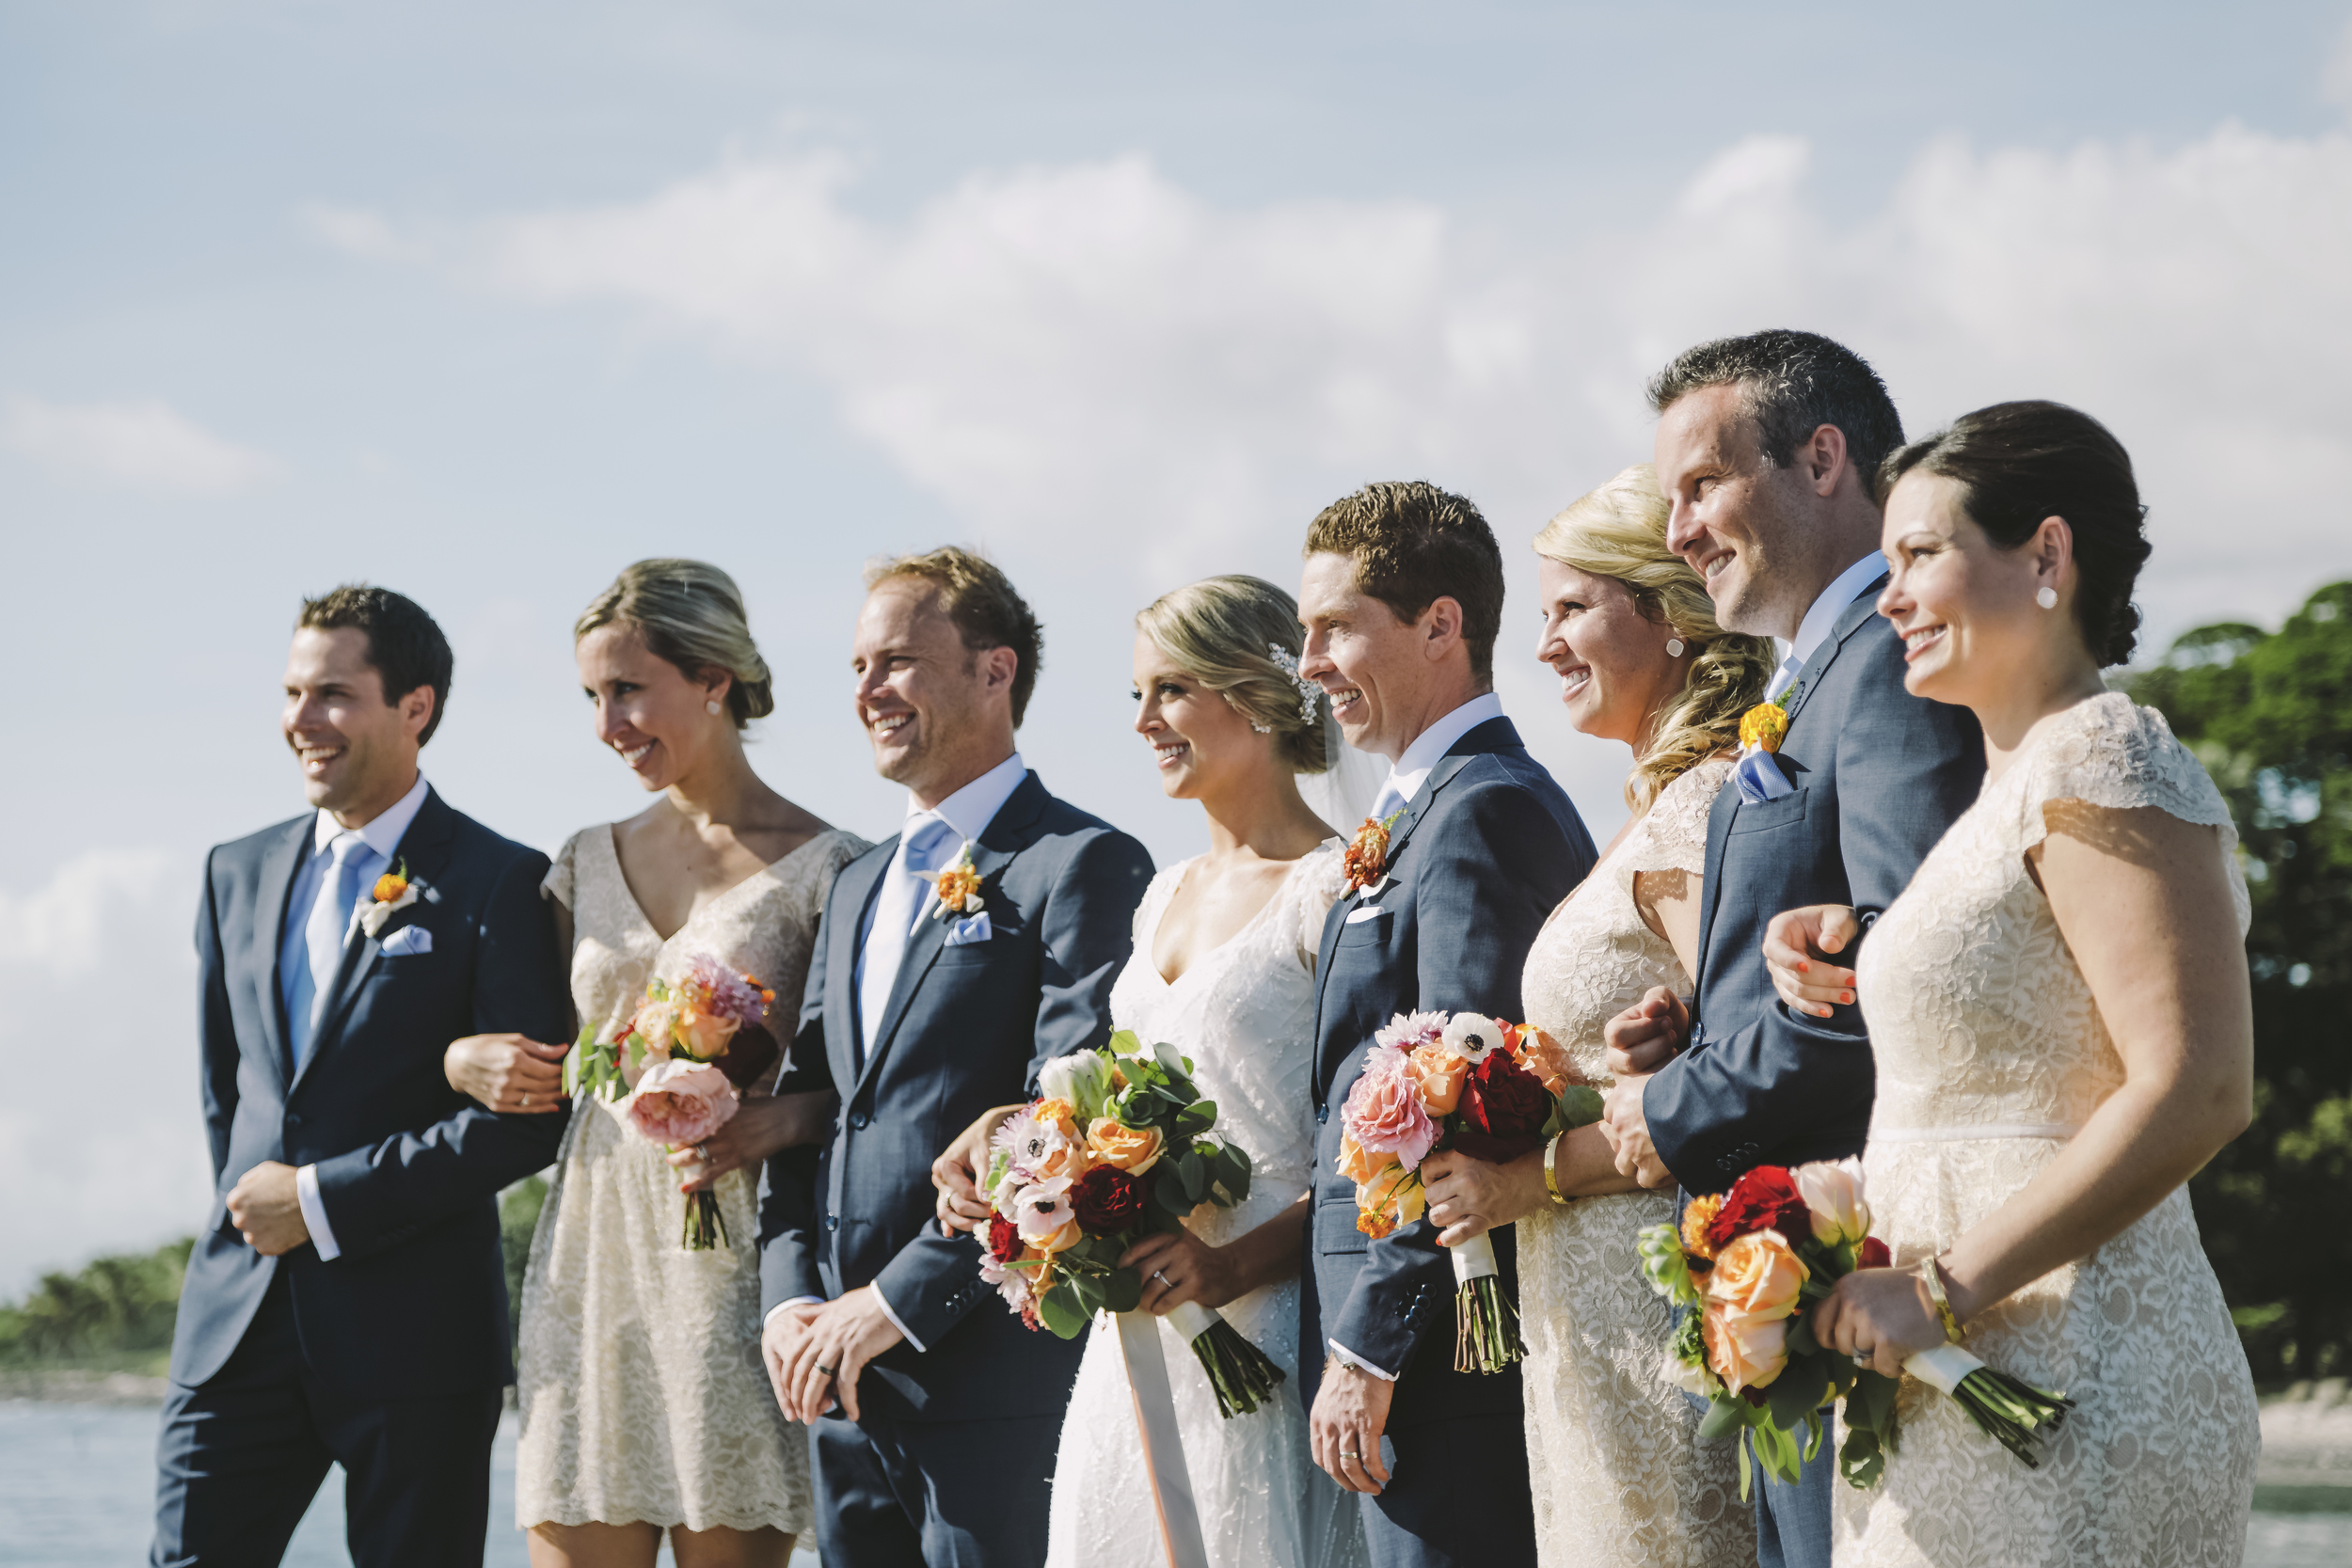 angie-diaz-photography-maui-wedding-mel-matt-55.jpeg